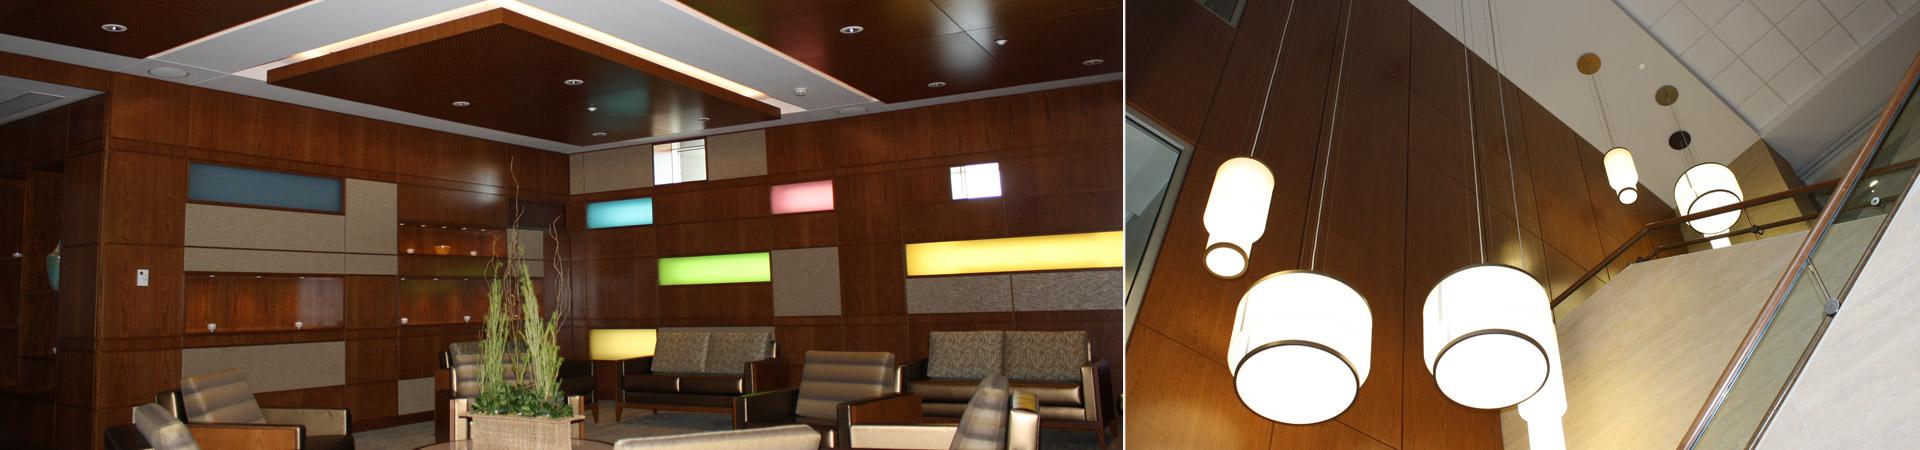 hospital-LED-lighting-fixtures1